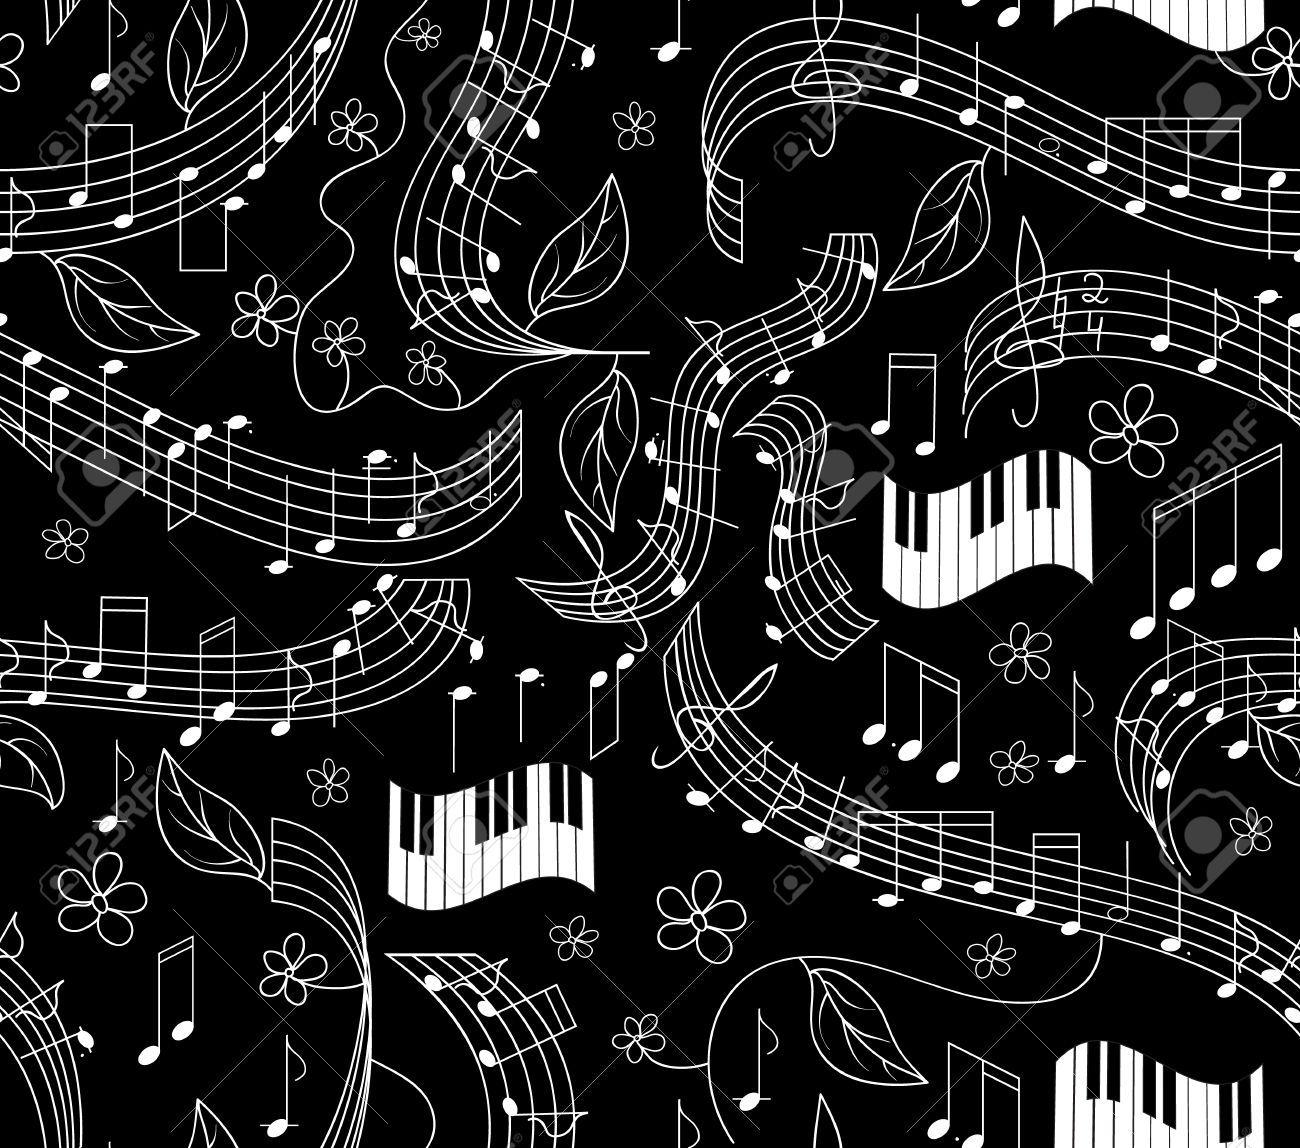 Popular Wallpaper Music Pattern - a23753bcdab9bf1707f355a2c64ded95  2018_37133.jpg